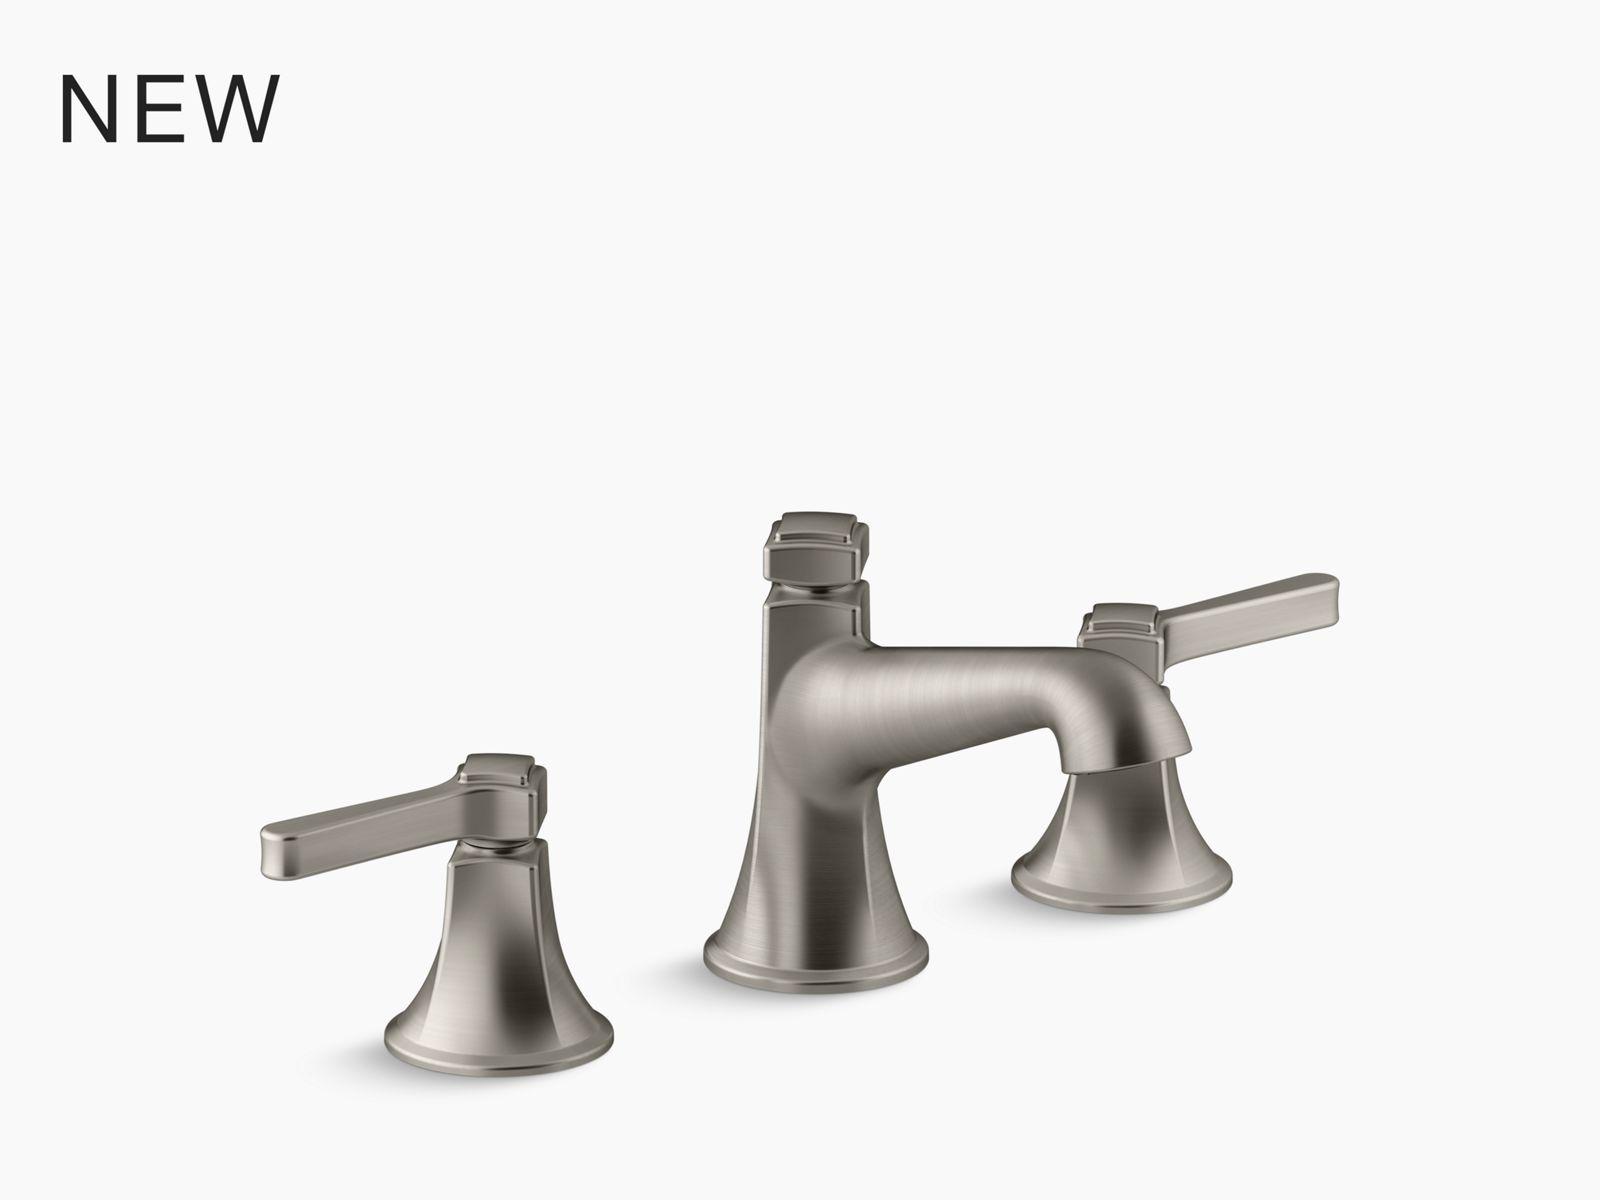 elmbrook widespread bathroom sink faucet